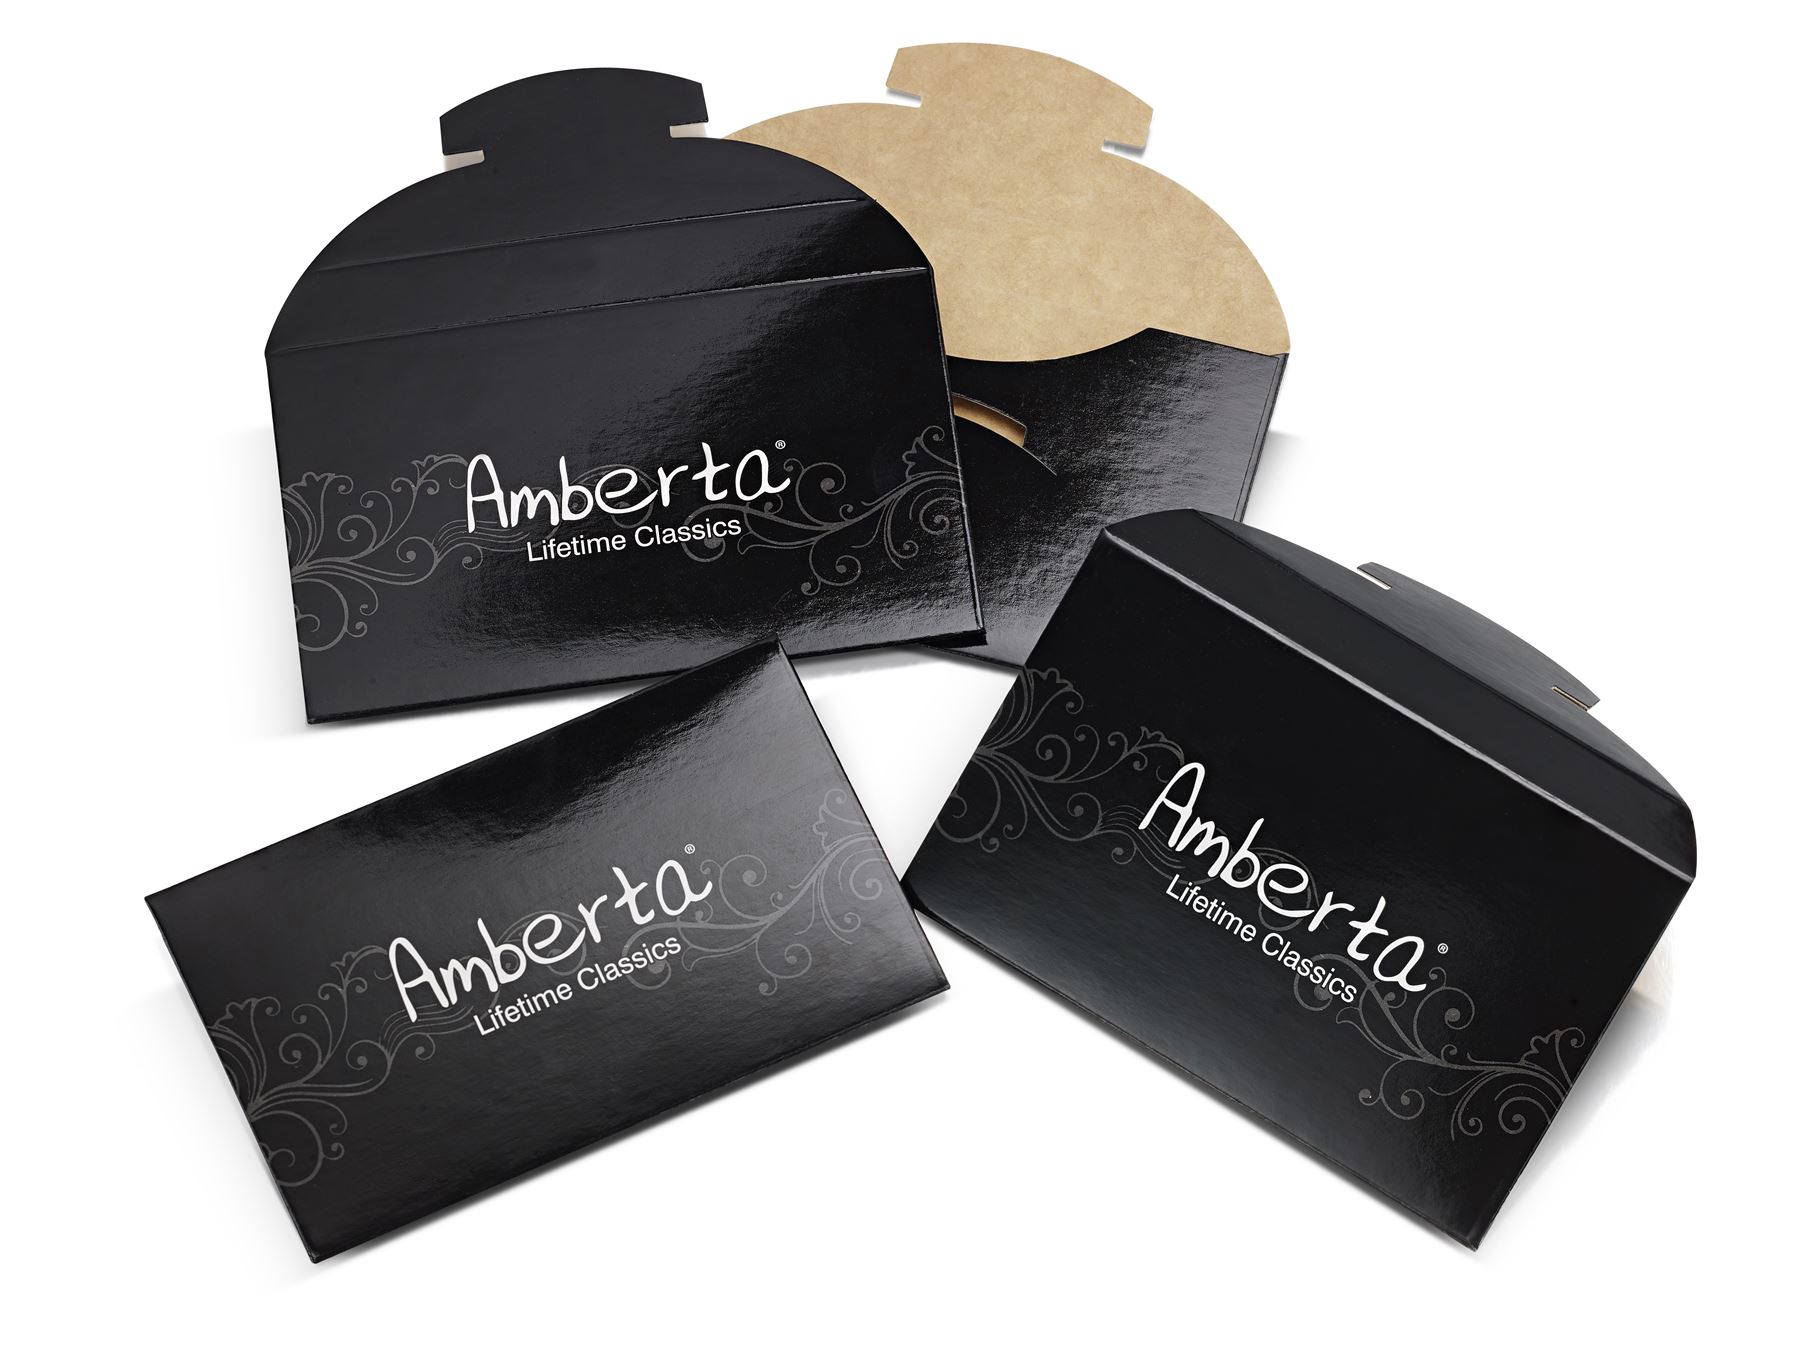 Amberta-Jewelry-925-Sterling-Silver-Adjustable-Bracelet-Italian-Bangle-for-Women miniature 89